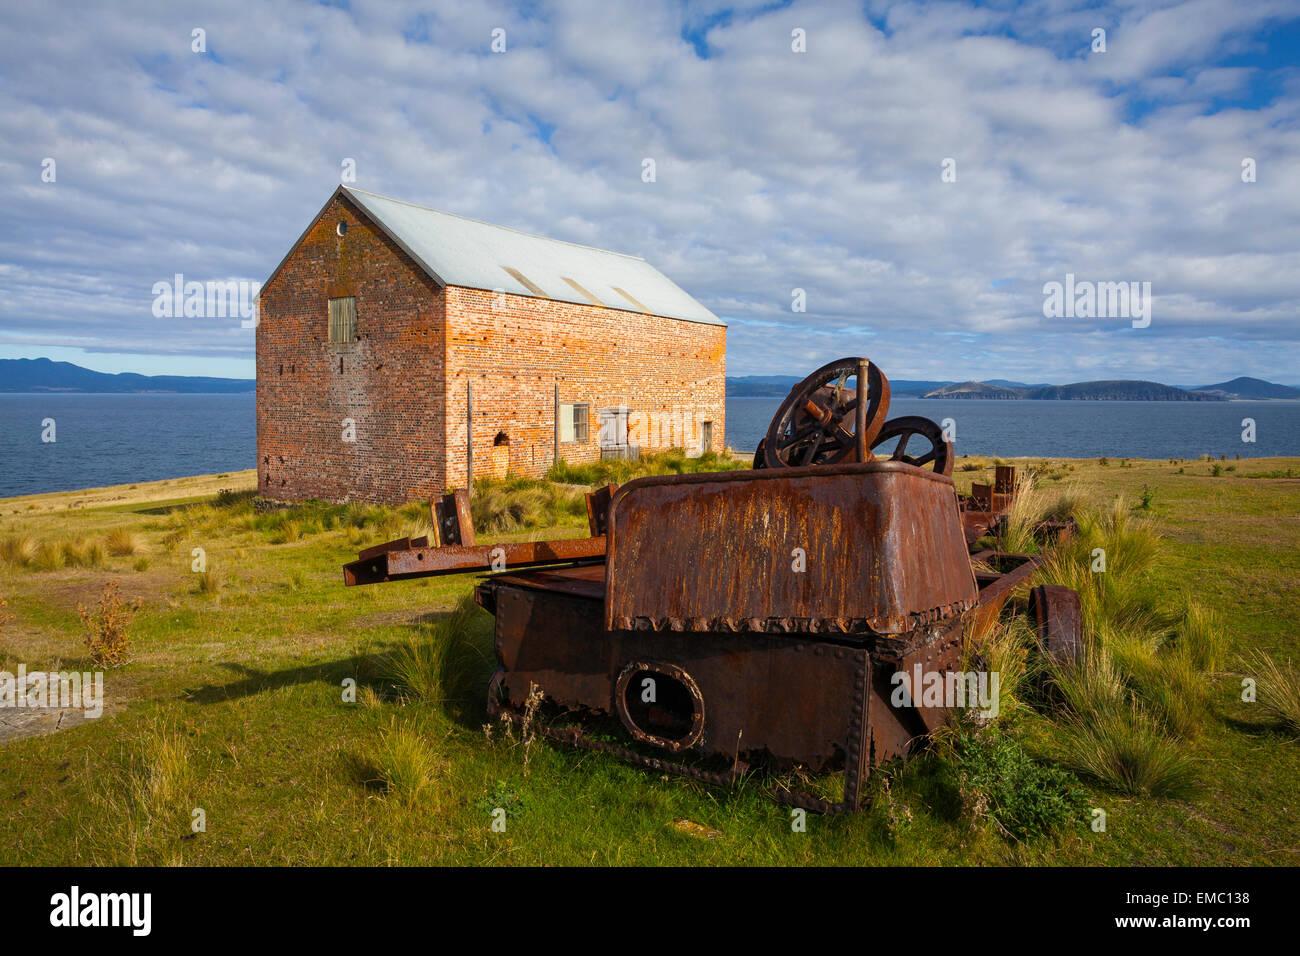 Convict Barn (c.1844) - Maria Island National Park - Tasmania - Australia - Stock Image